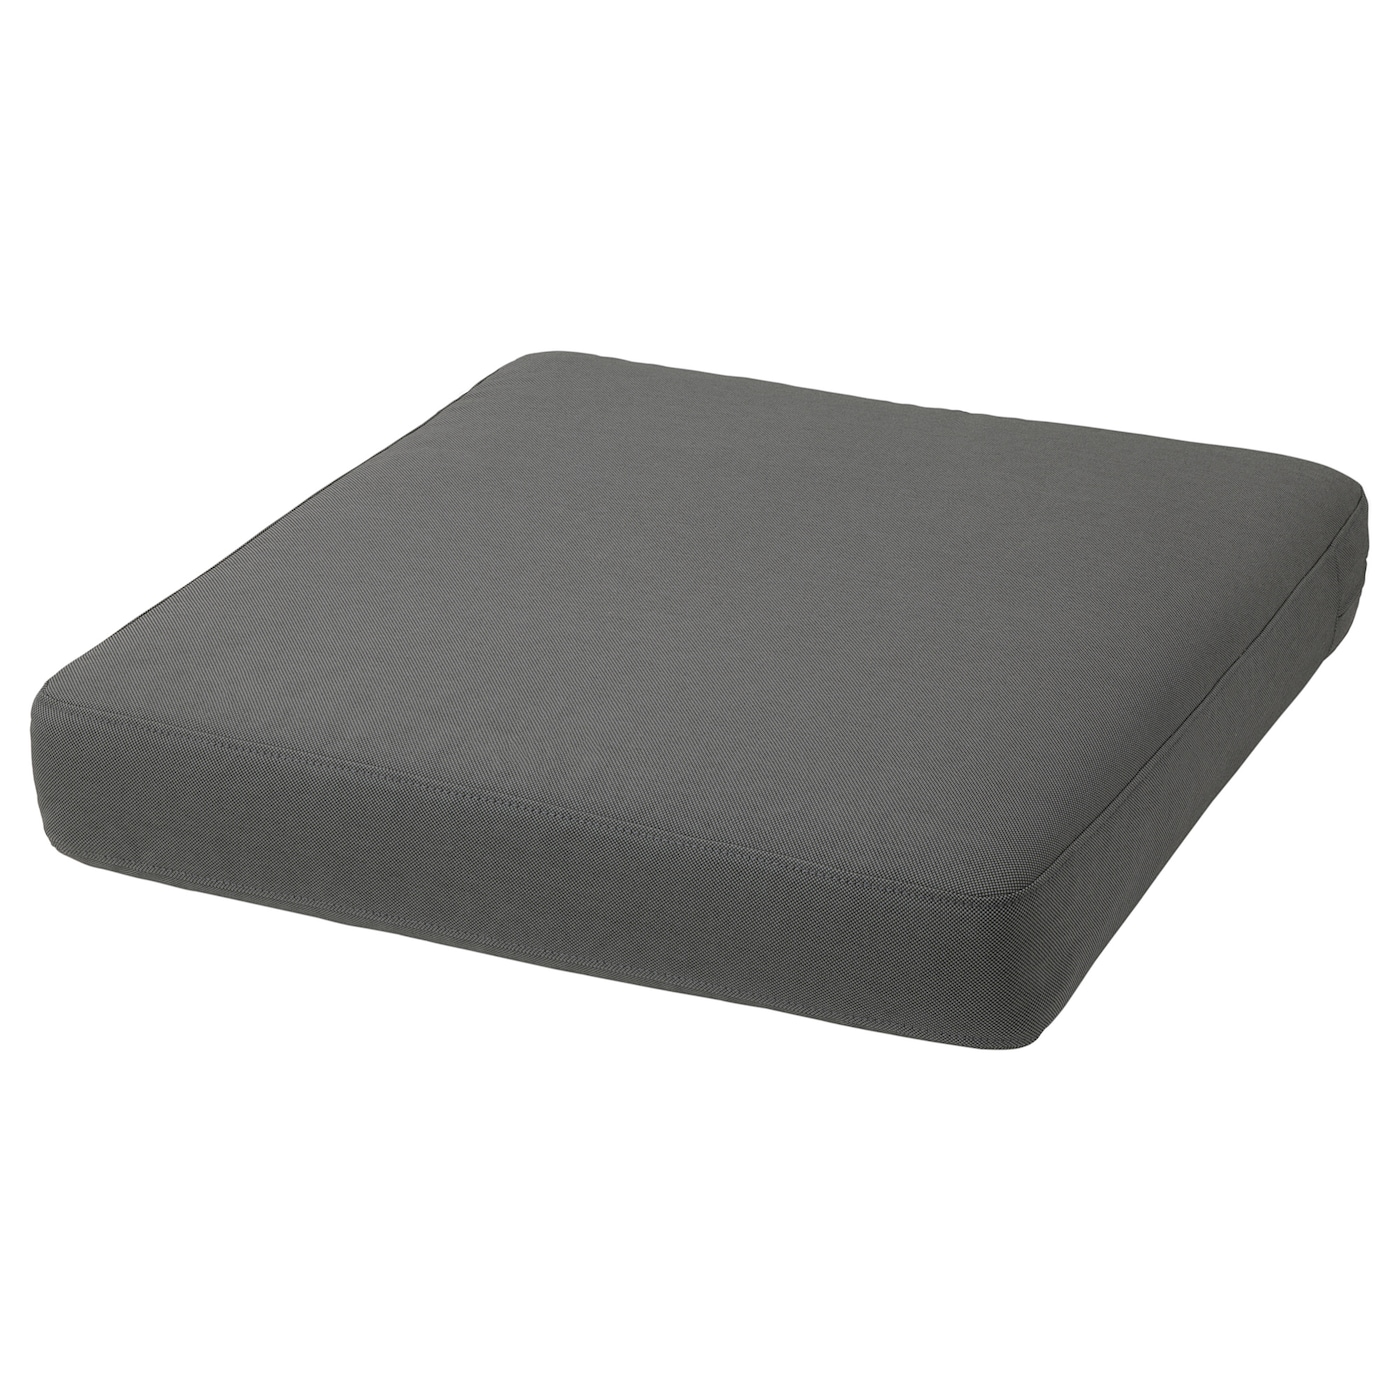 Froson Duvholmen Seat Pad Outdoor Dark Gray Ikea